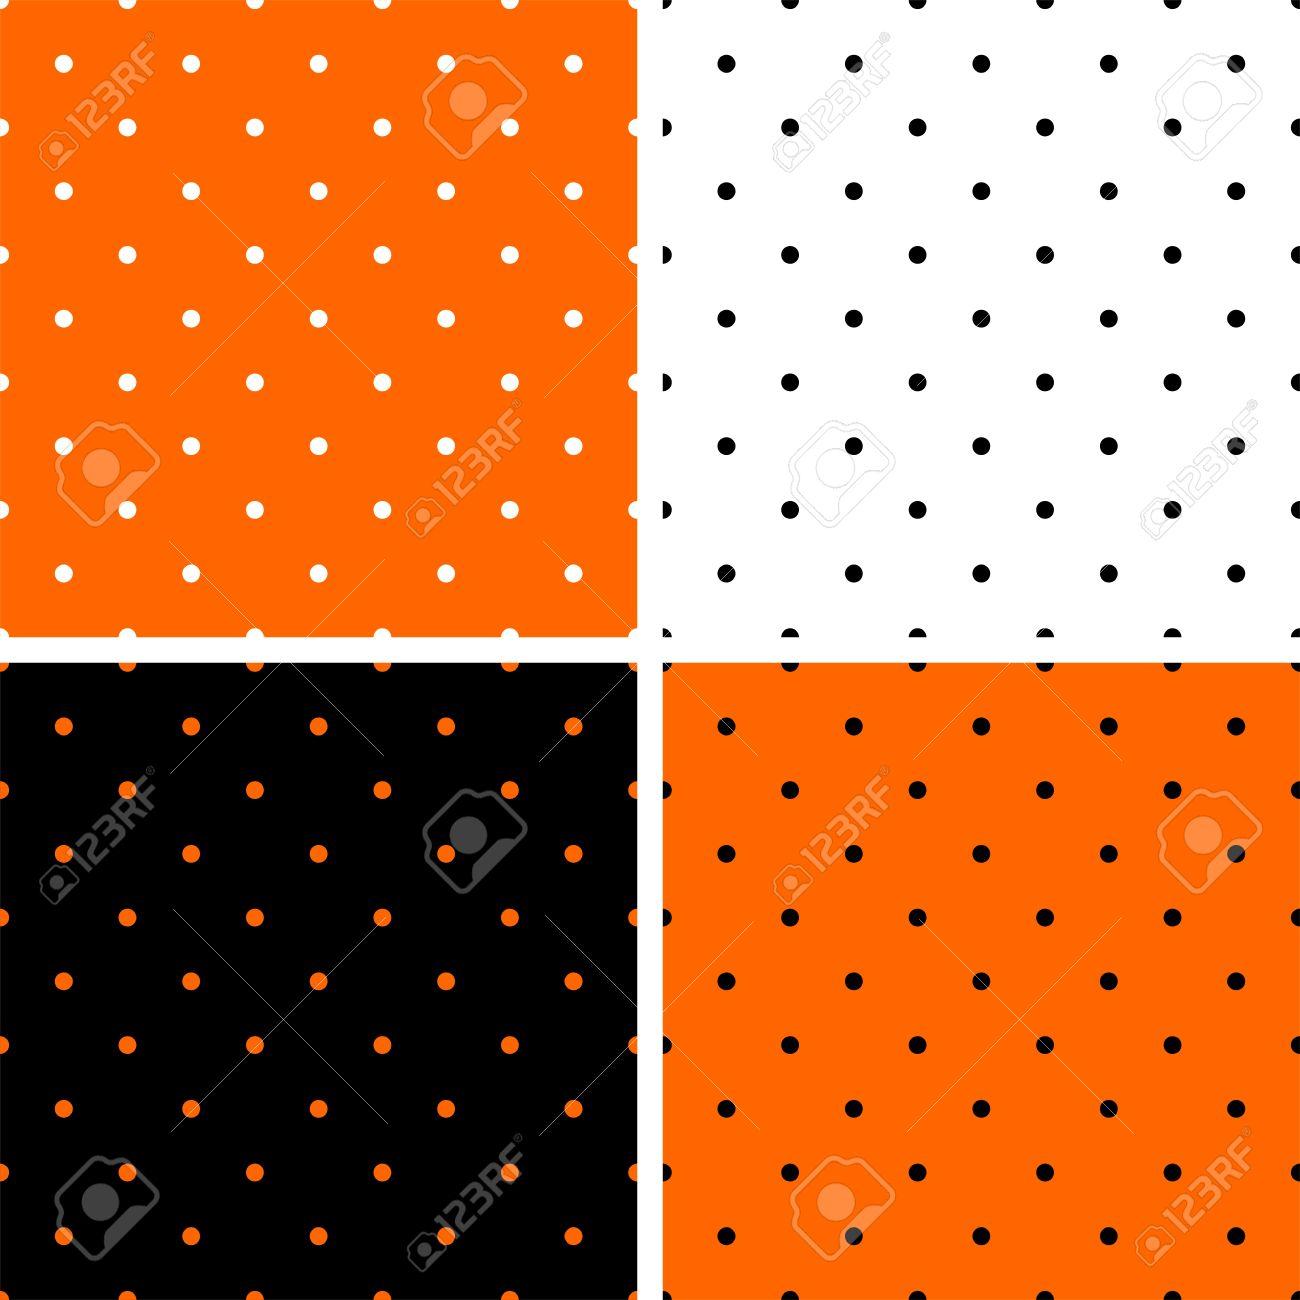 Wonderful Wallpaper Halloween Polka Dot - 44858968-polka-dots-orange-black-and-white-background-set-tile-decoration-wallpaper-or-autumn-vector-pattern-  HD_2110078.jpg